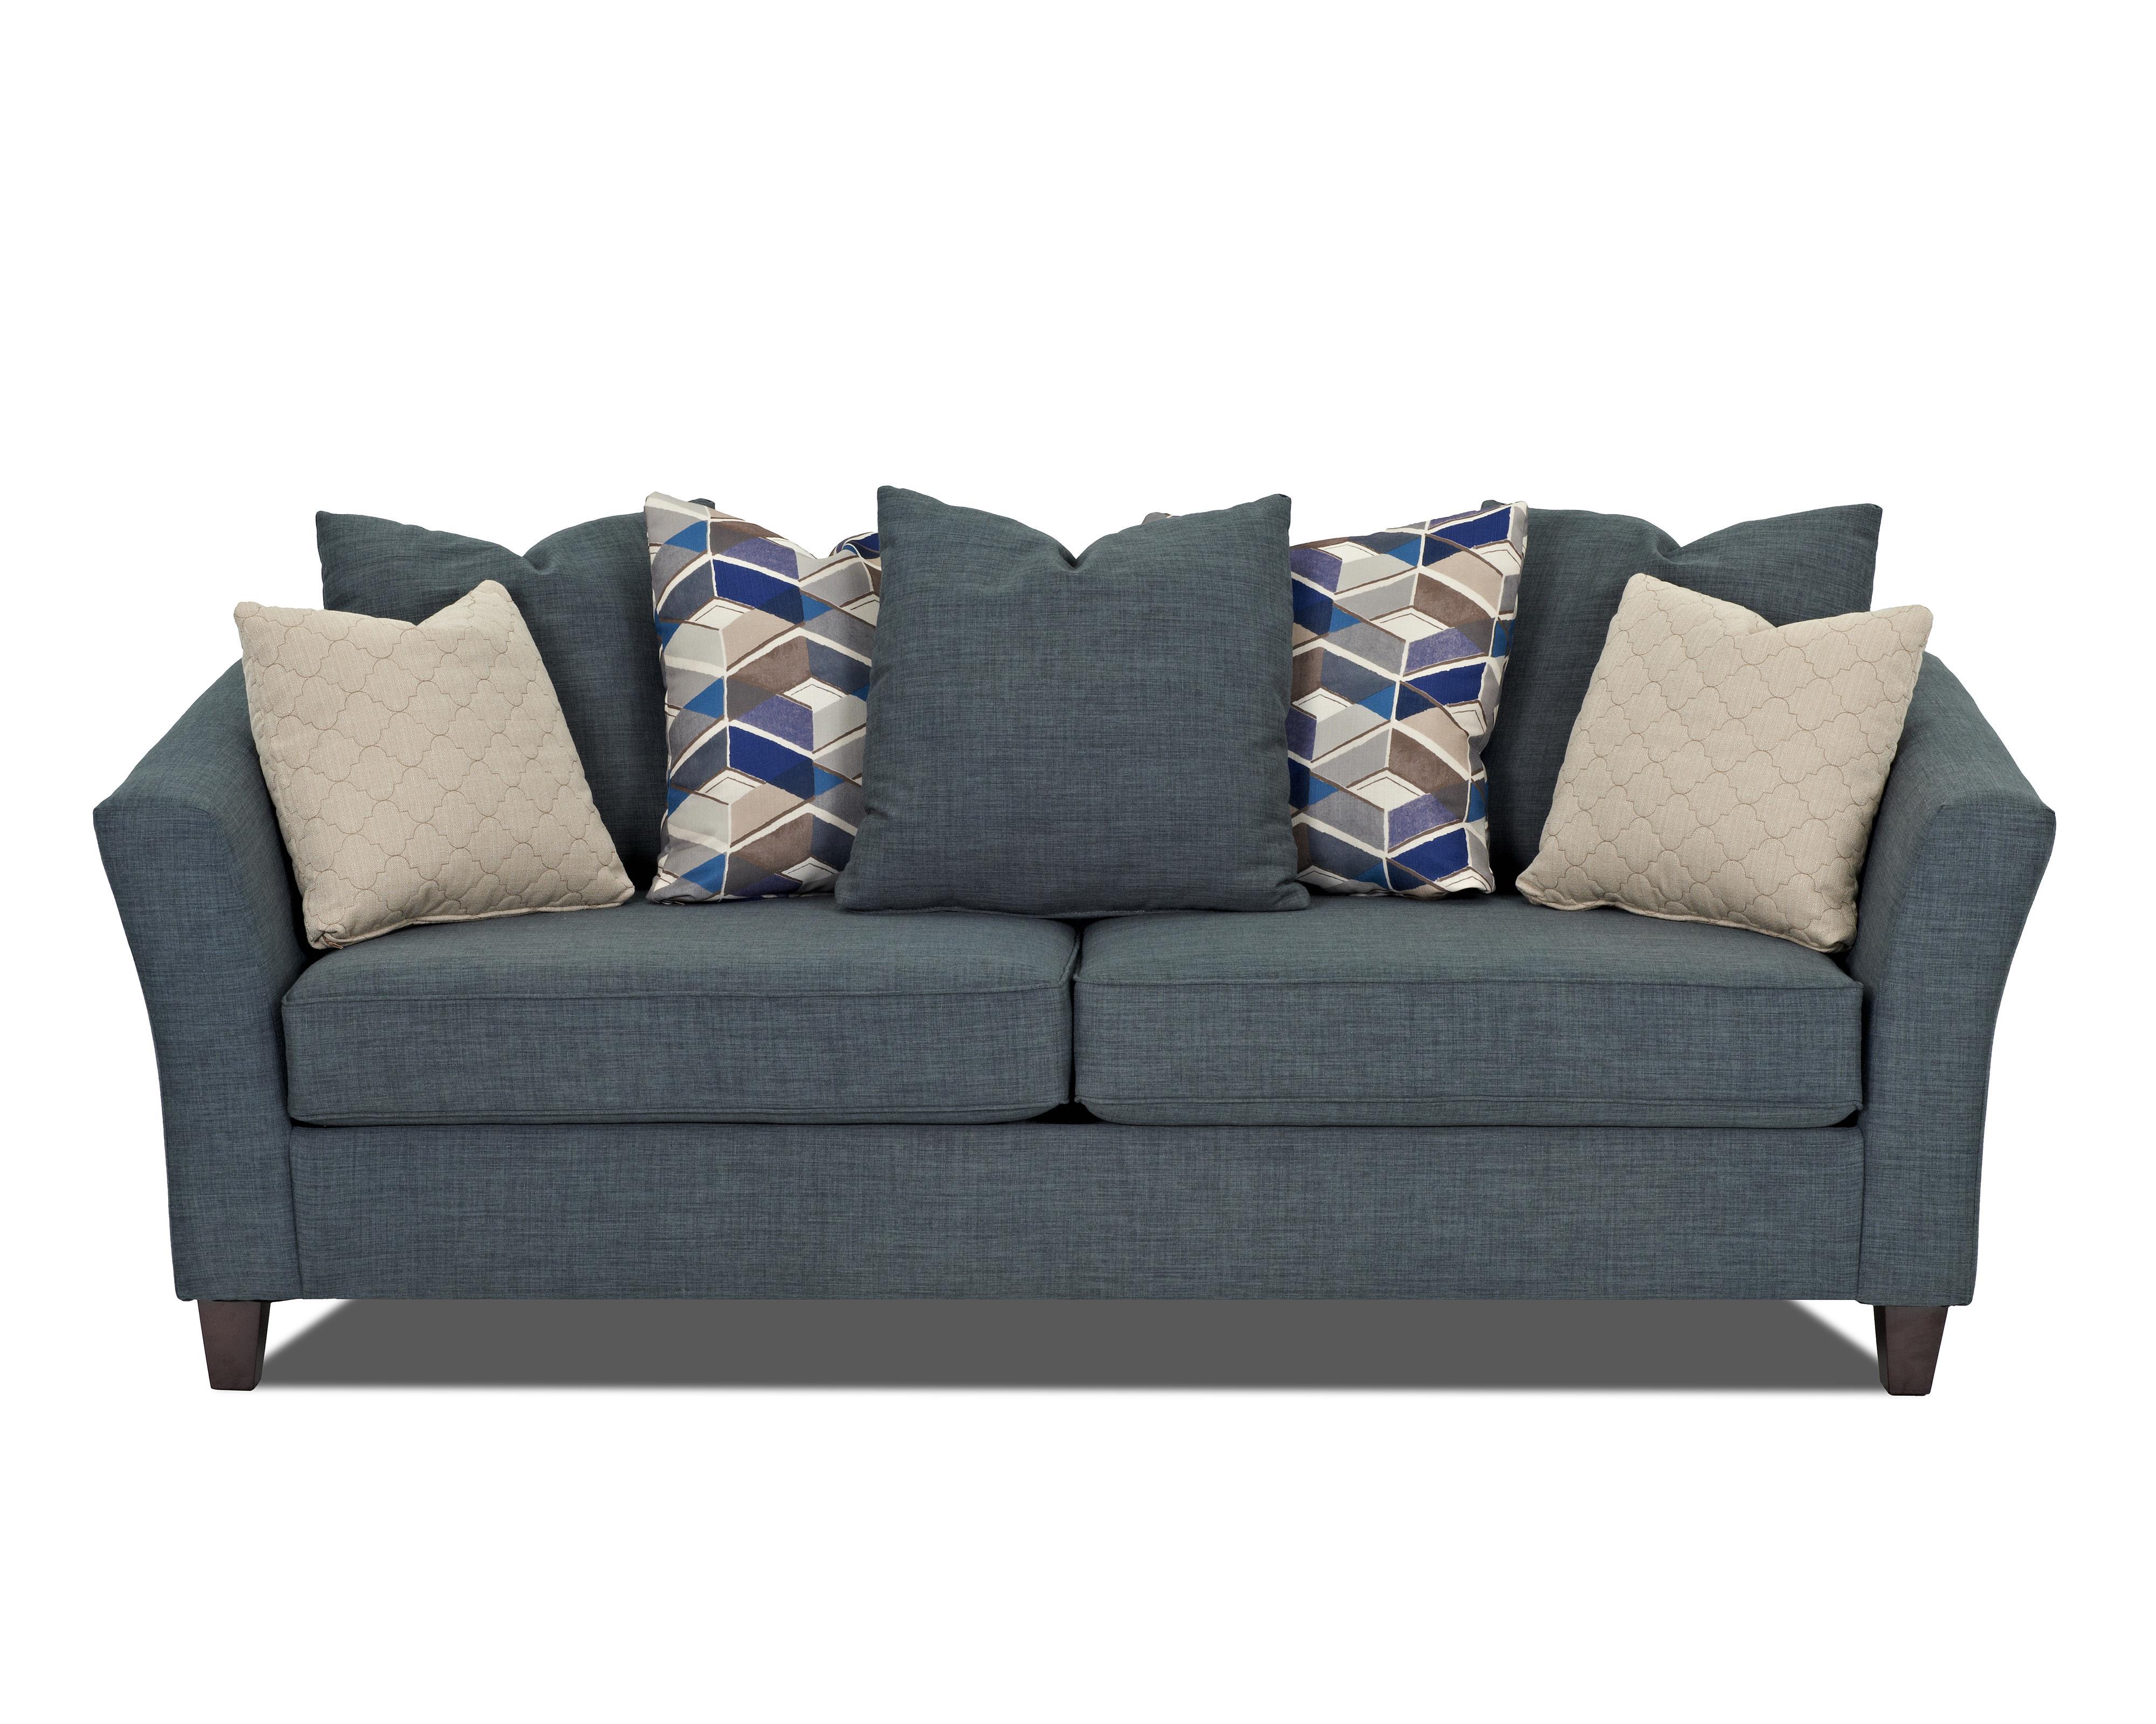 Klaussner Culpepper Sofa - Item Number: K40000 S-Fand-Turq